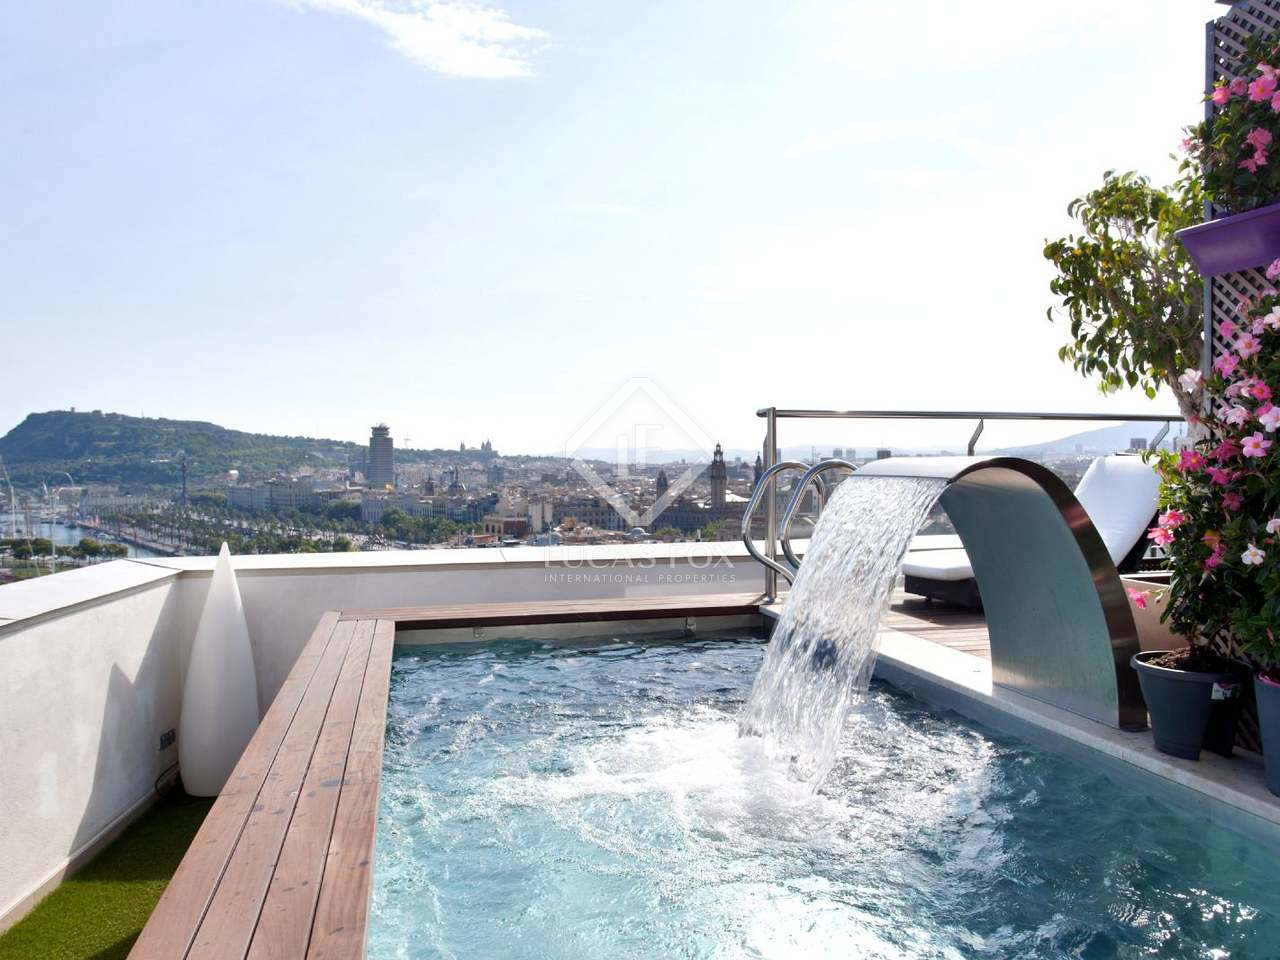 Penthouse en vente ciutat vella barcelone for Appart hotel barcelone avec piscine